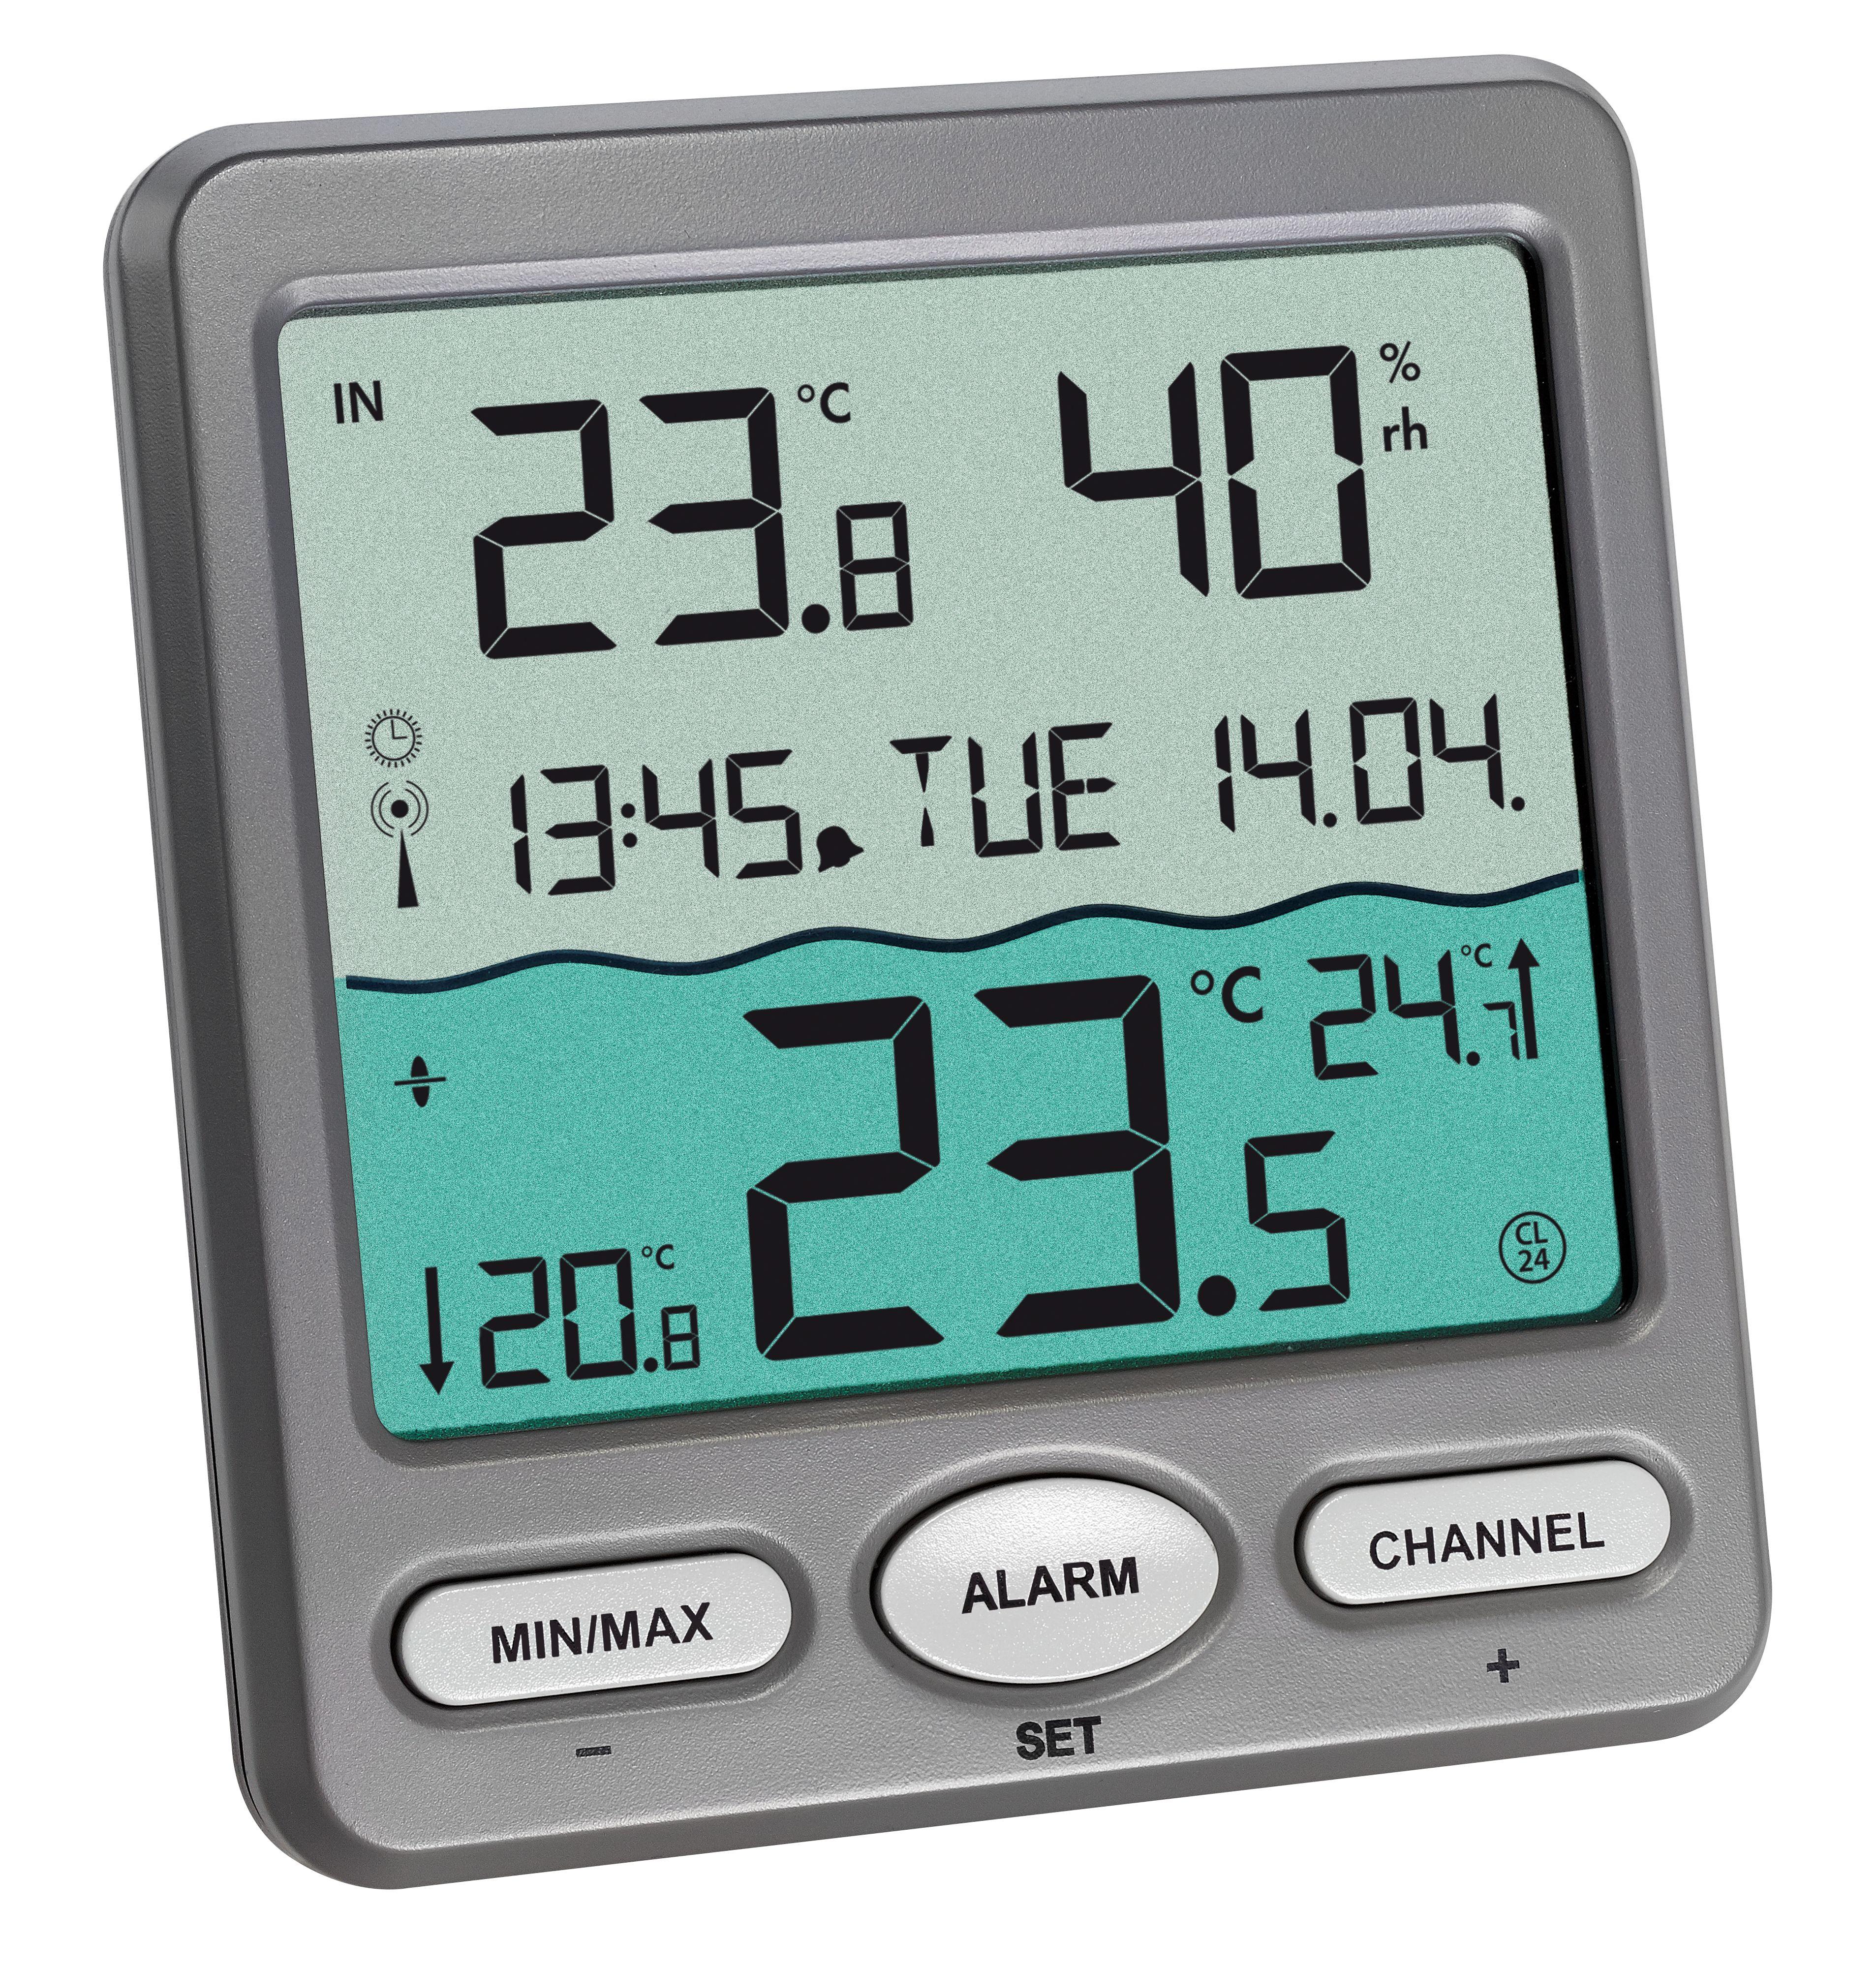 Tfa dostmann venice funk pool thermometer - Thermometre piscine sans fil ...